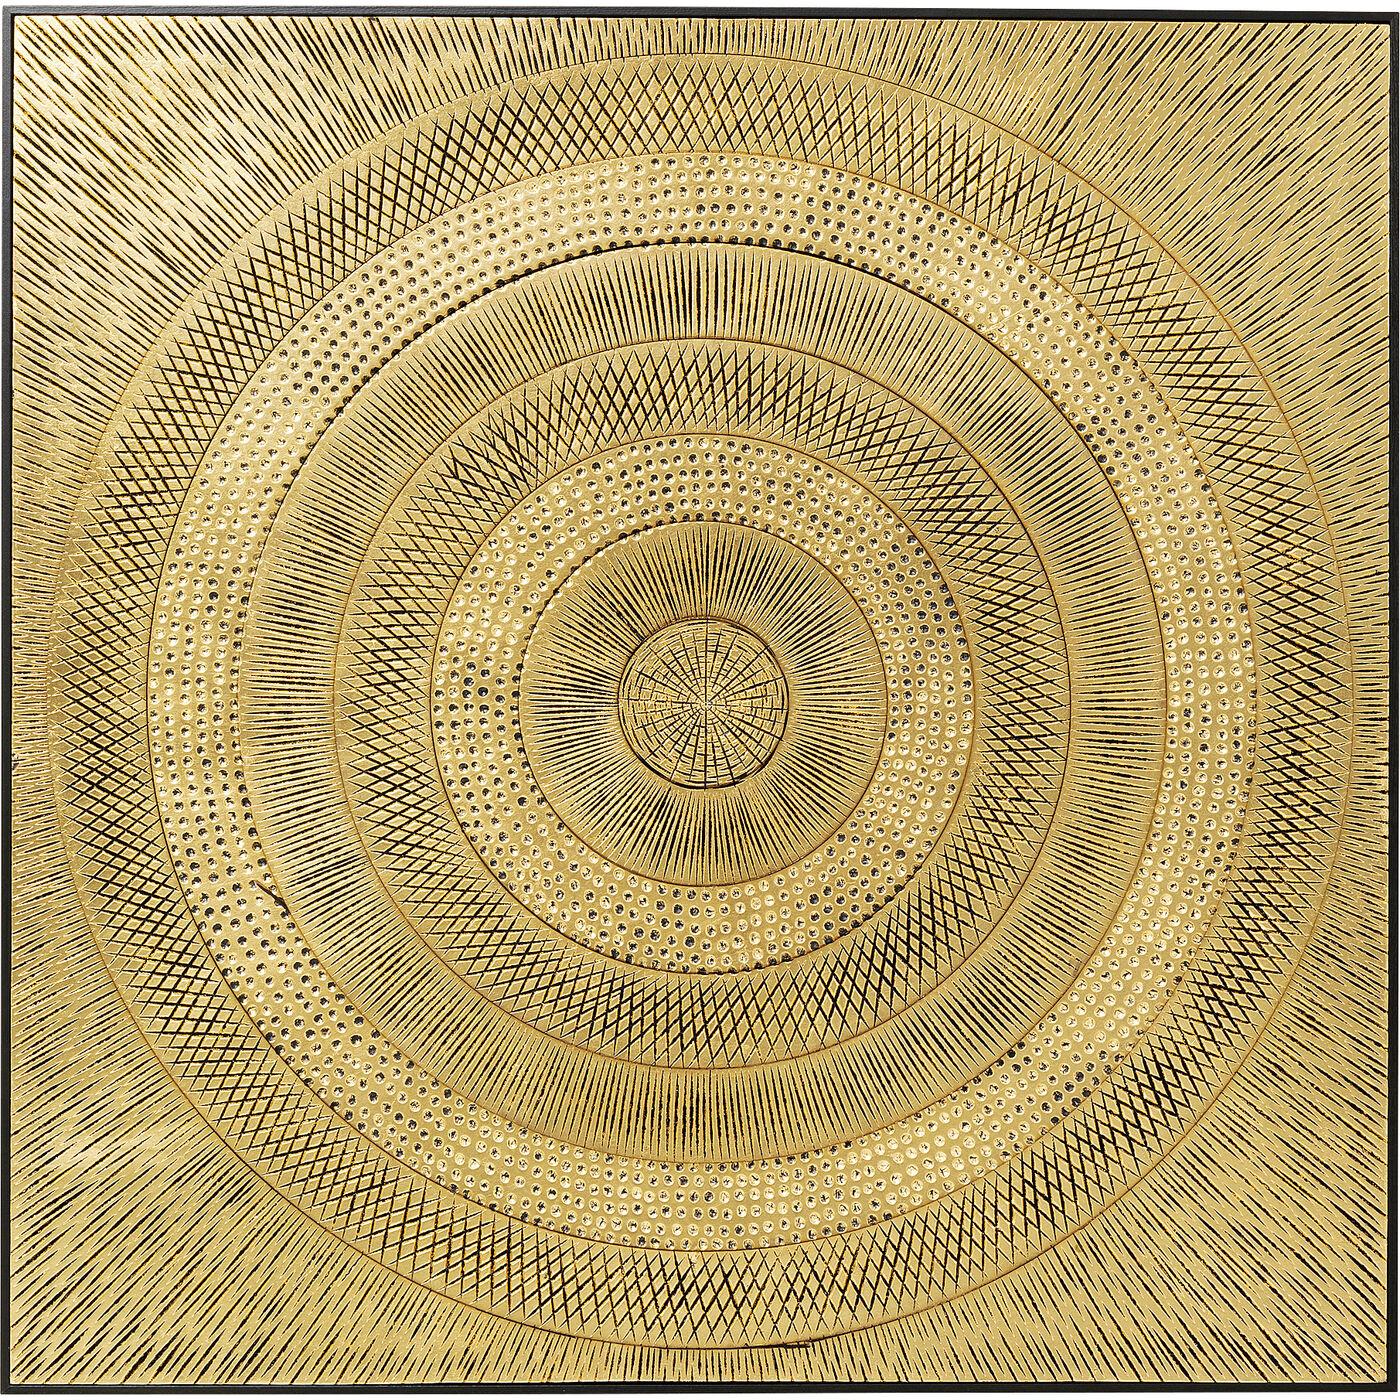 Objektbild Art Circle Gold 120x120